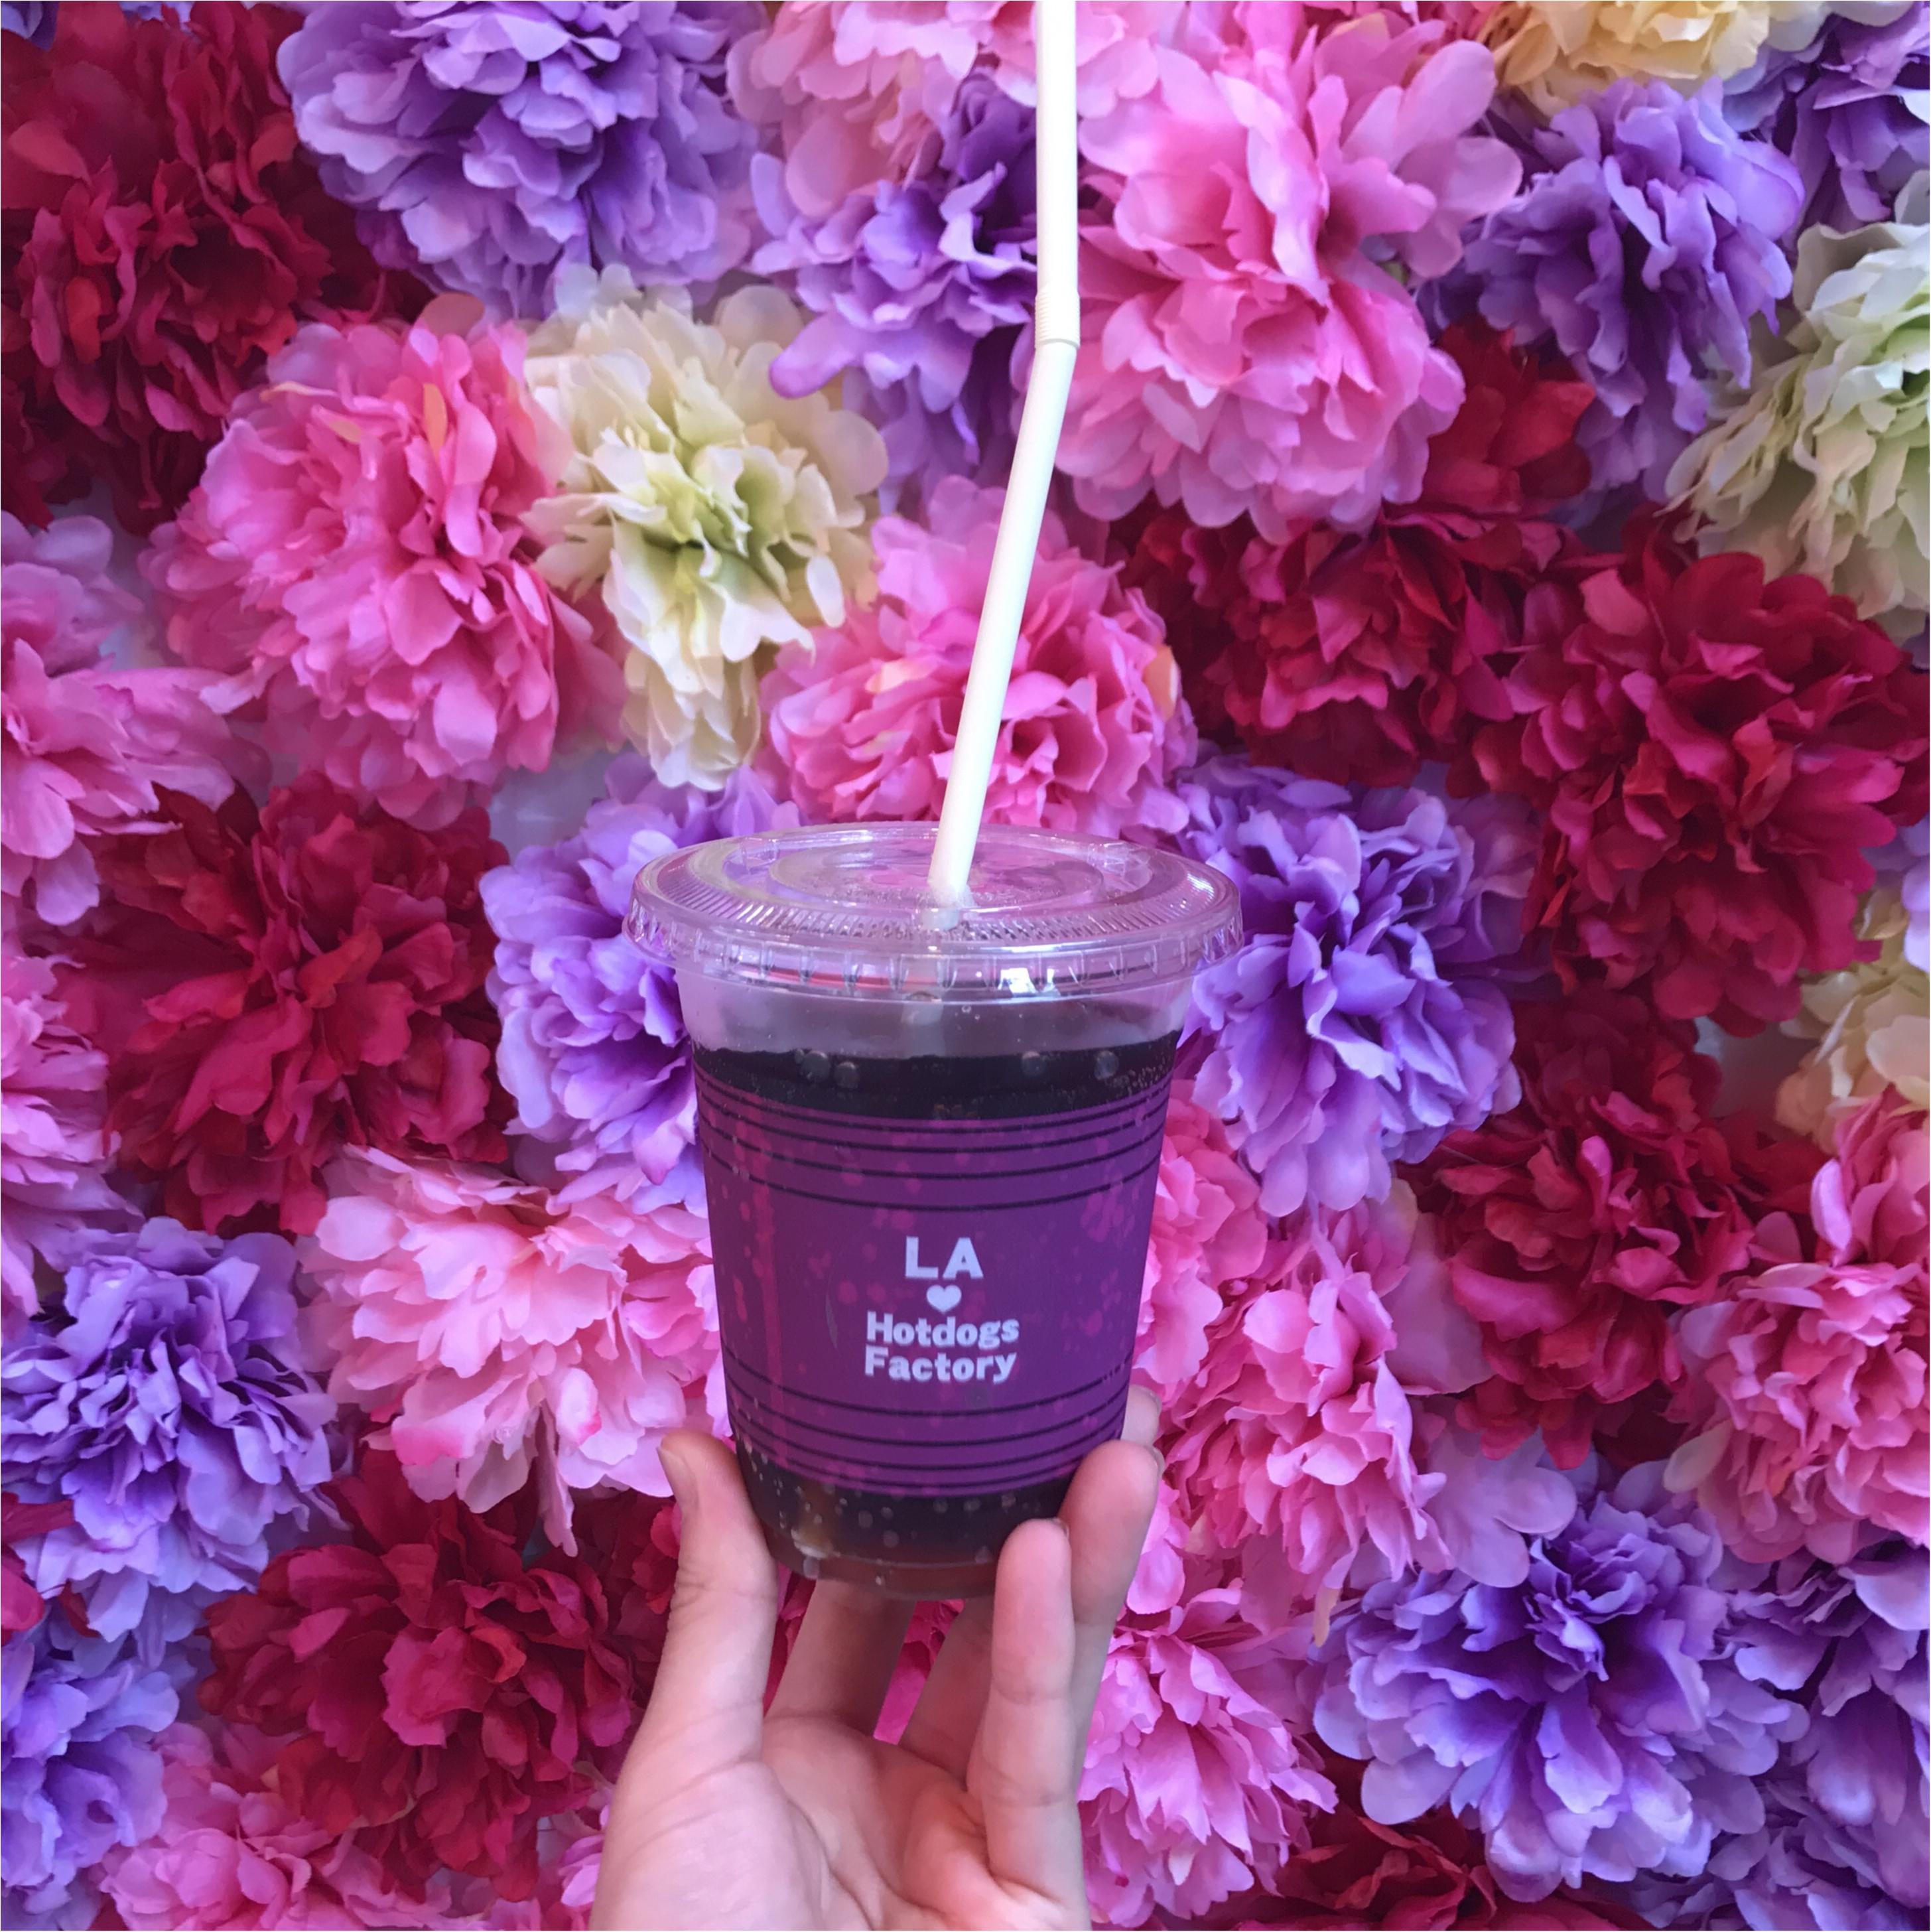 【FOOD】沖縄で人気のカフェが池袋に♡!これから流行る!\LA❤︎Hotdogs Factory/_5